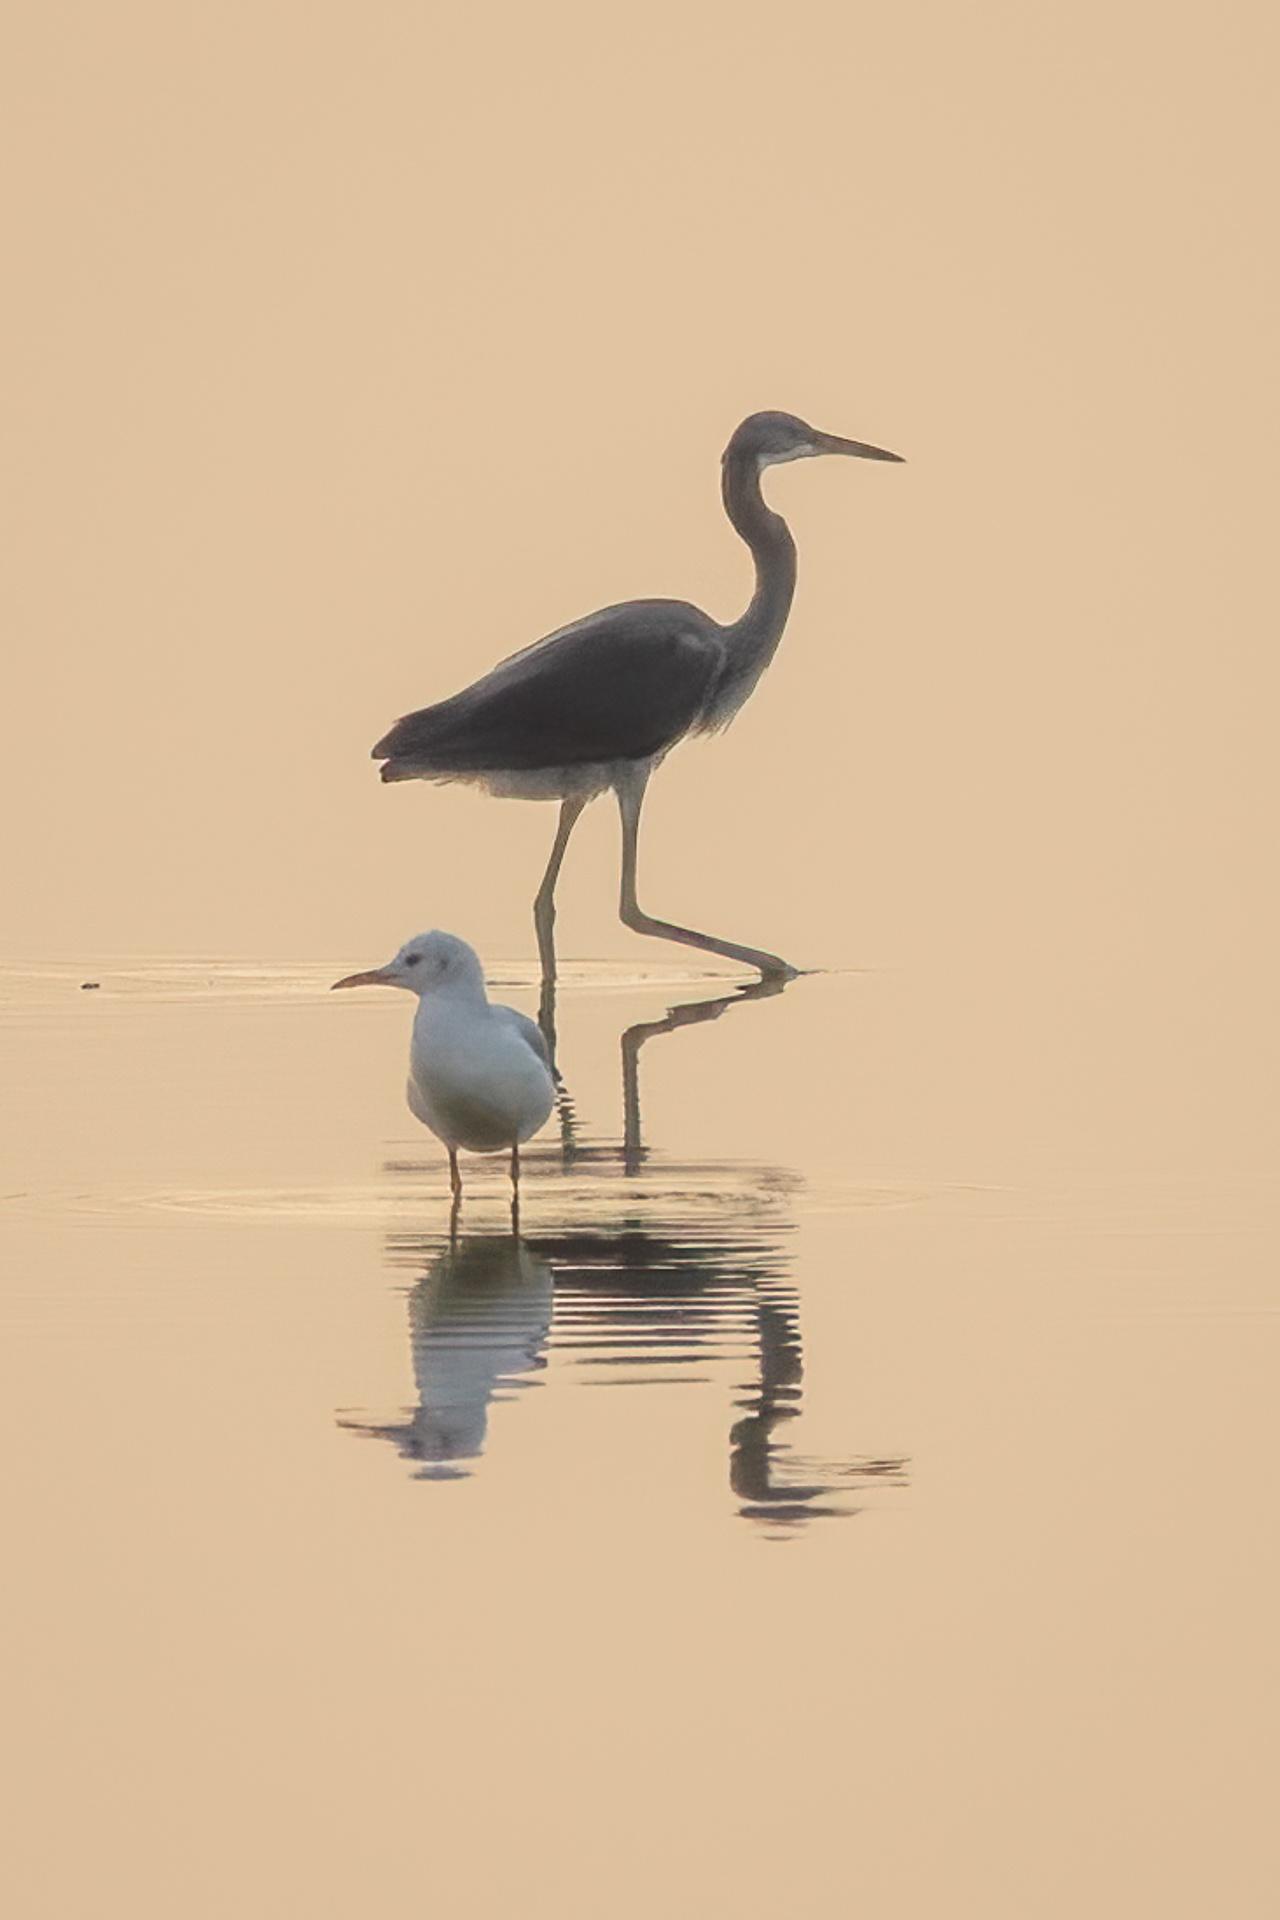 Bird reflections at sunset